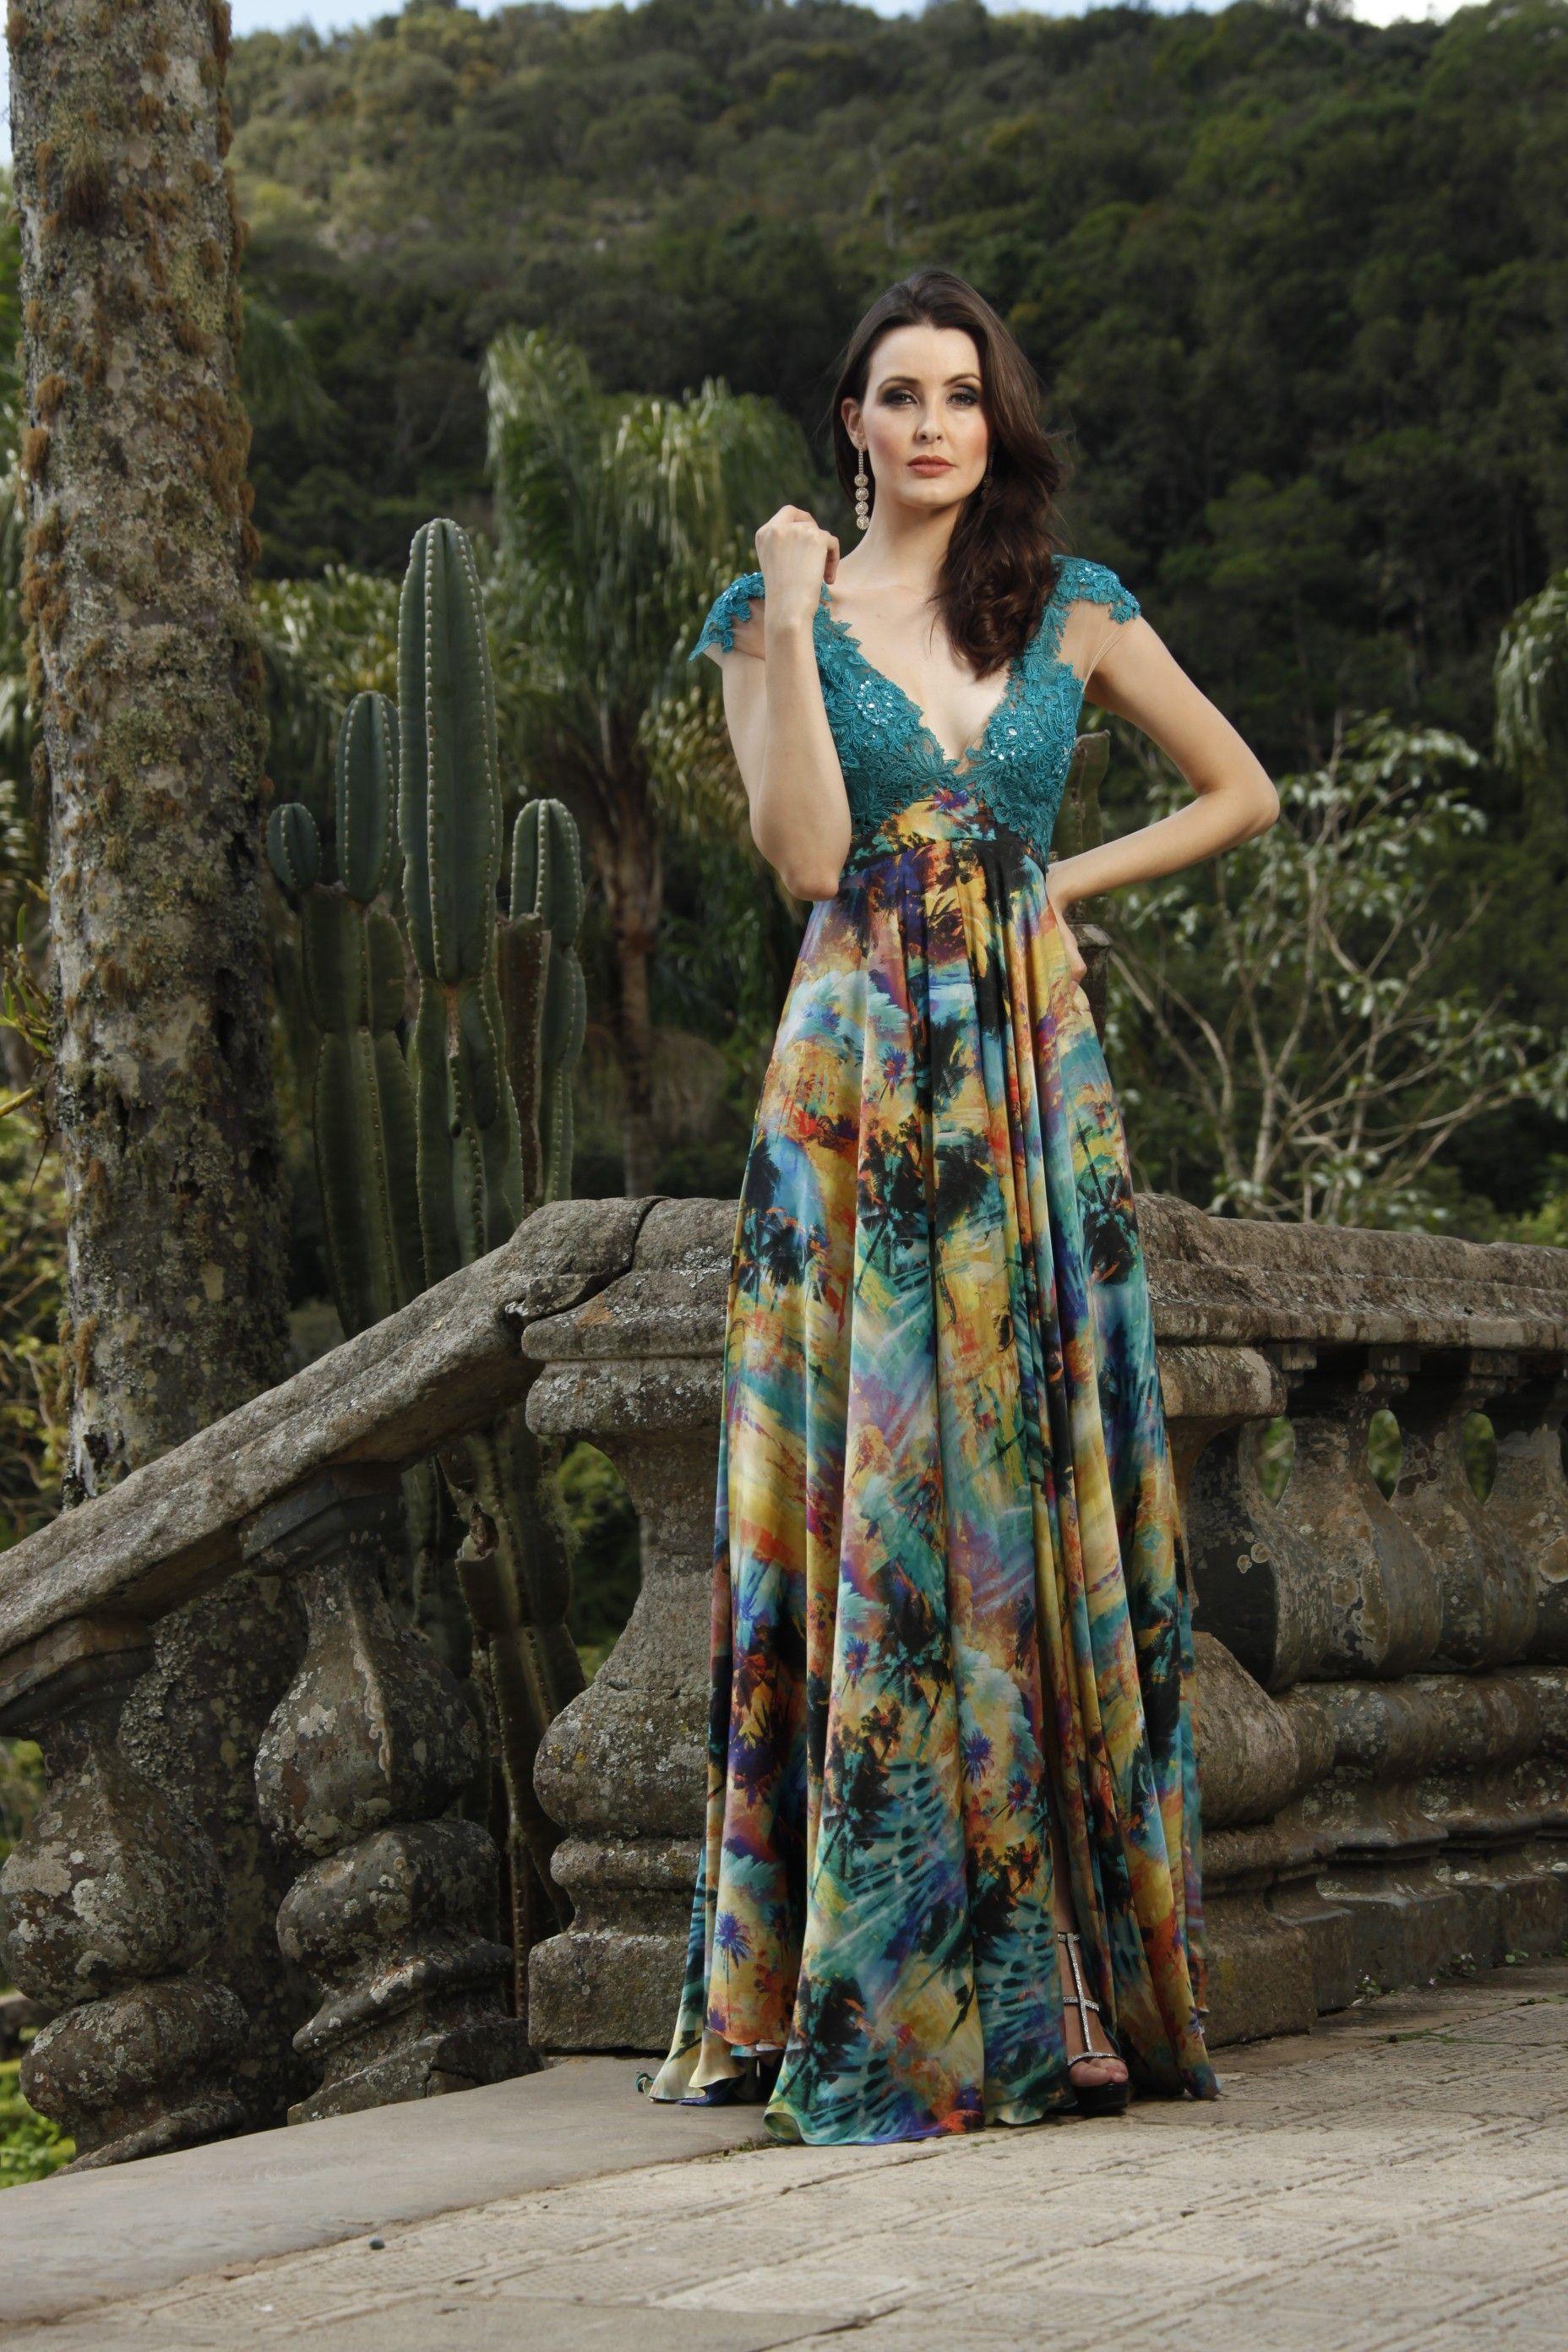 af4c80d49 vestido longo estampado - Pesquisa Google | vestidos | Dresses ...